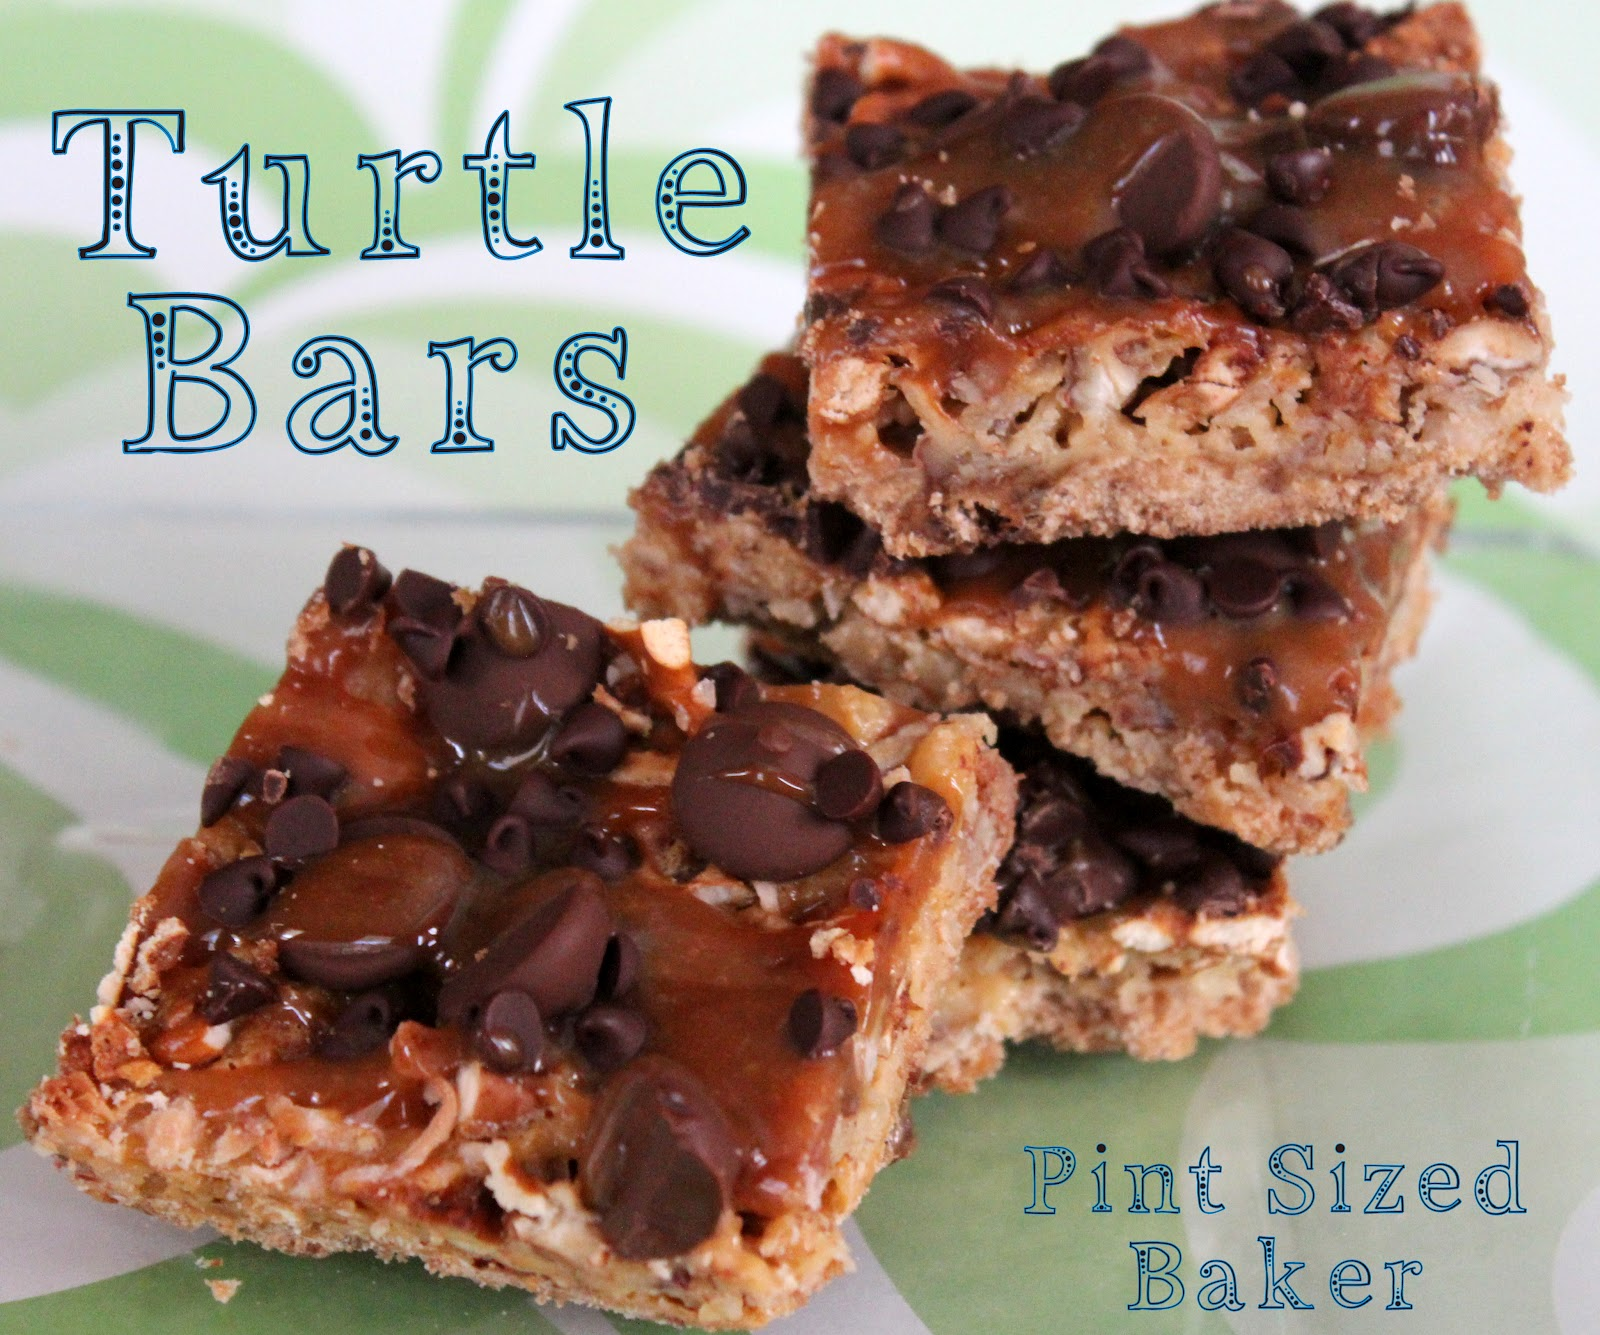 Turtle Shortbread Bars - Pint Sized Baker